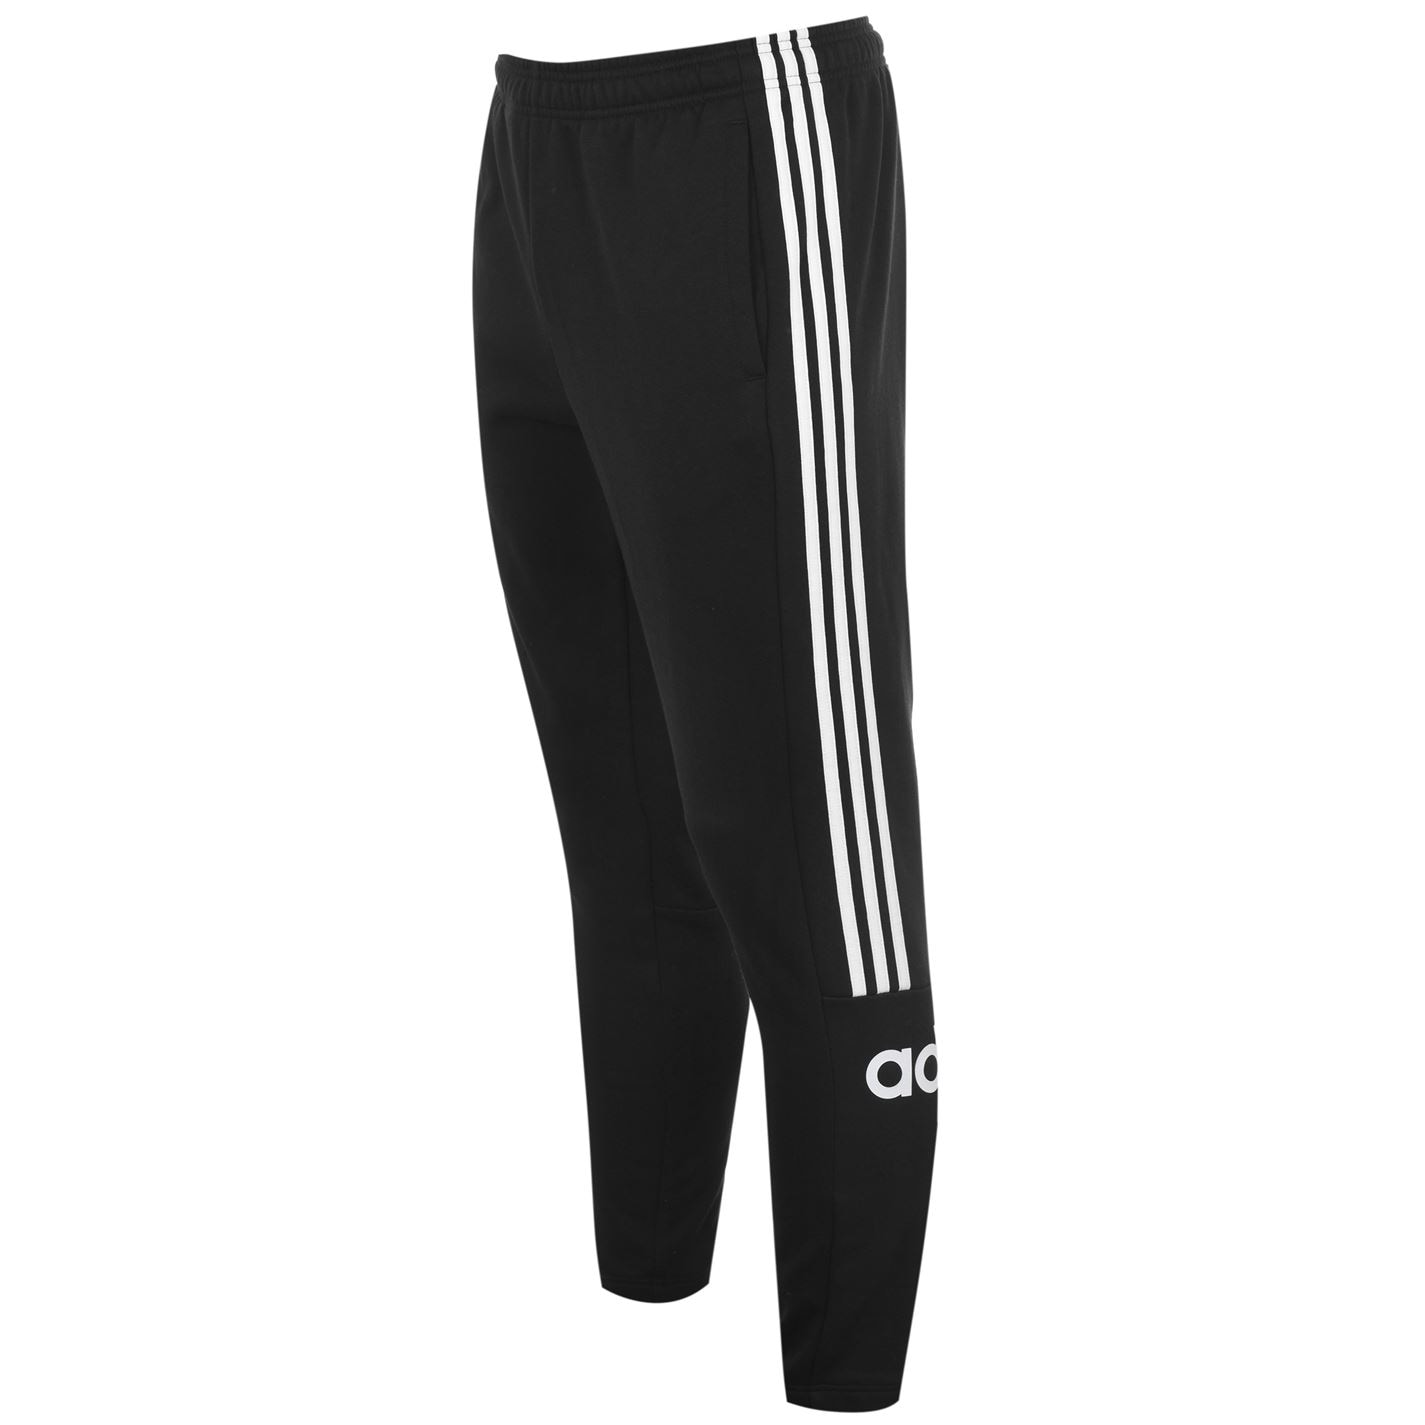 Pantaloni adidas Essentials 3-Stripes pentru Barbati negru alb